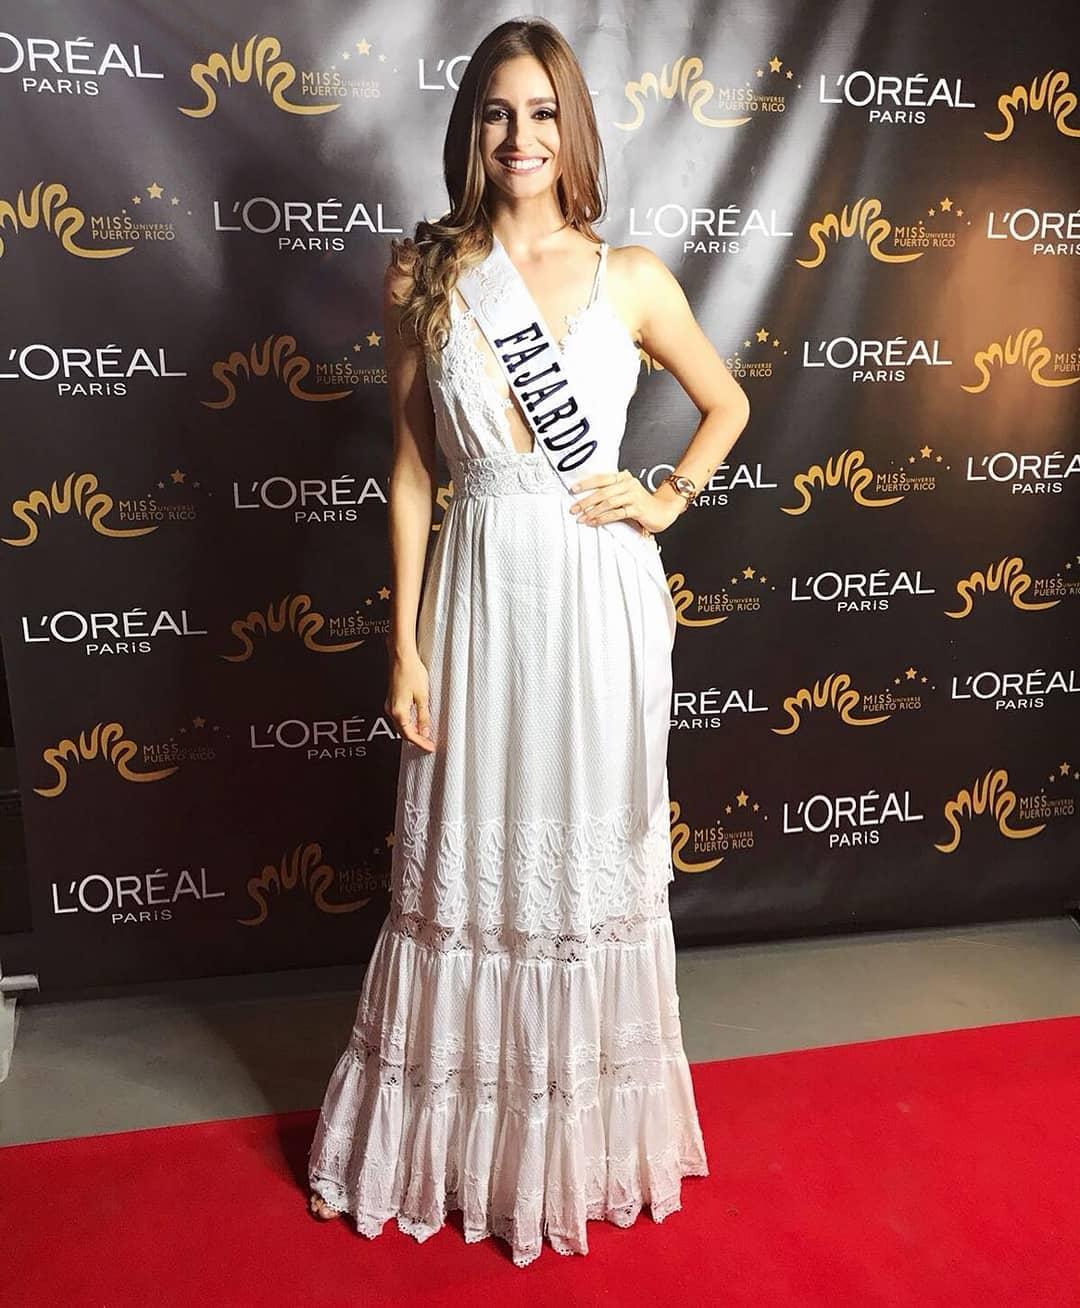 larissa santiago, miss fajardo universo 2018/top 5 de miss supranational 2017. - Página 4 33559612